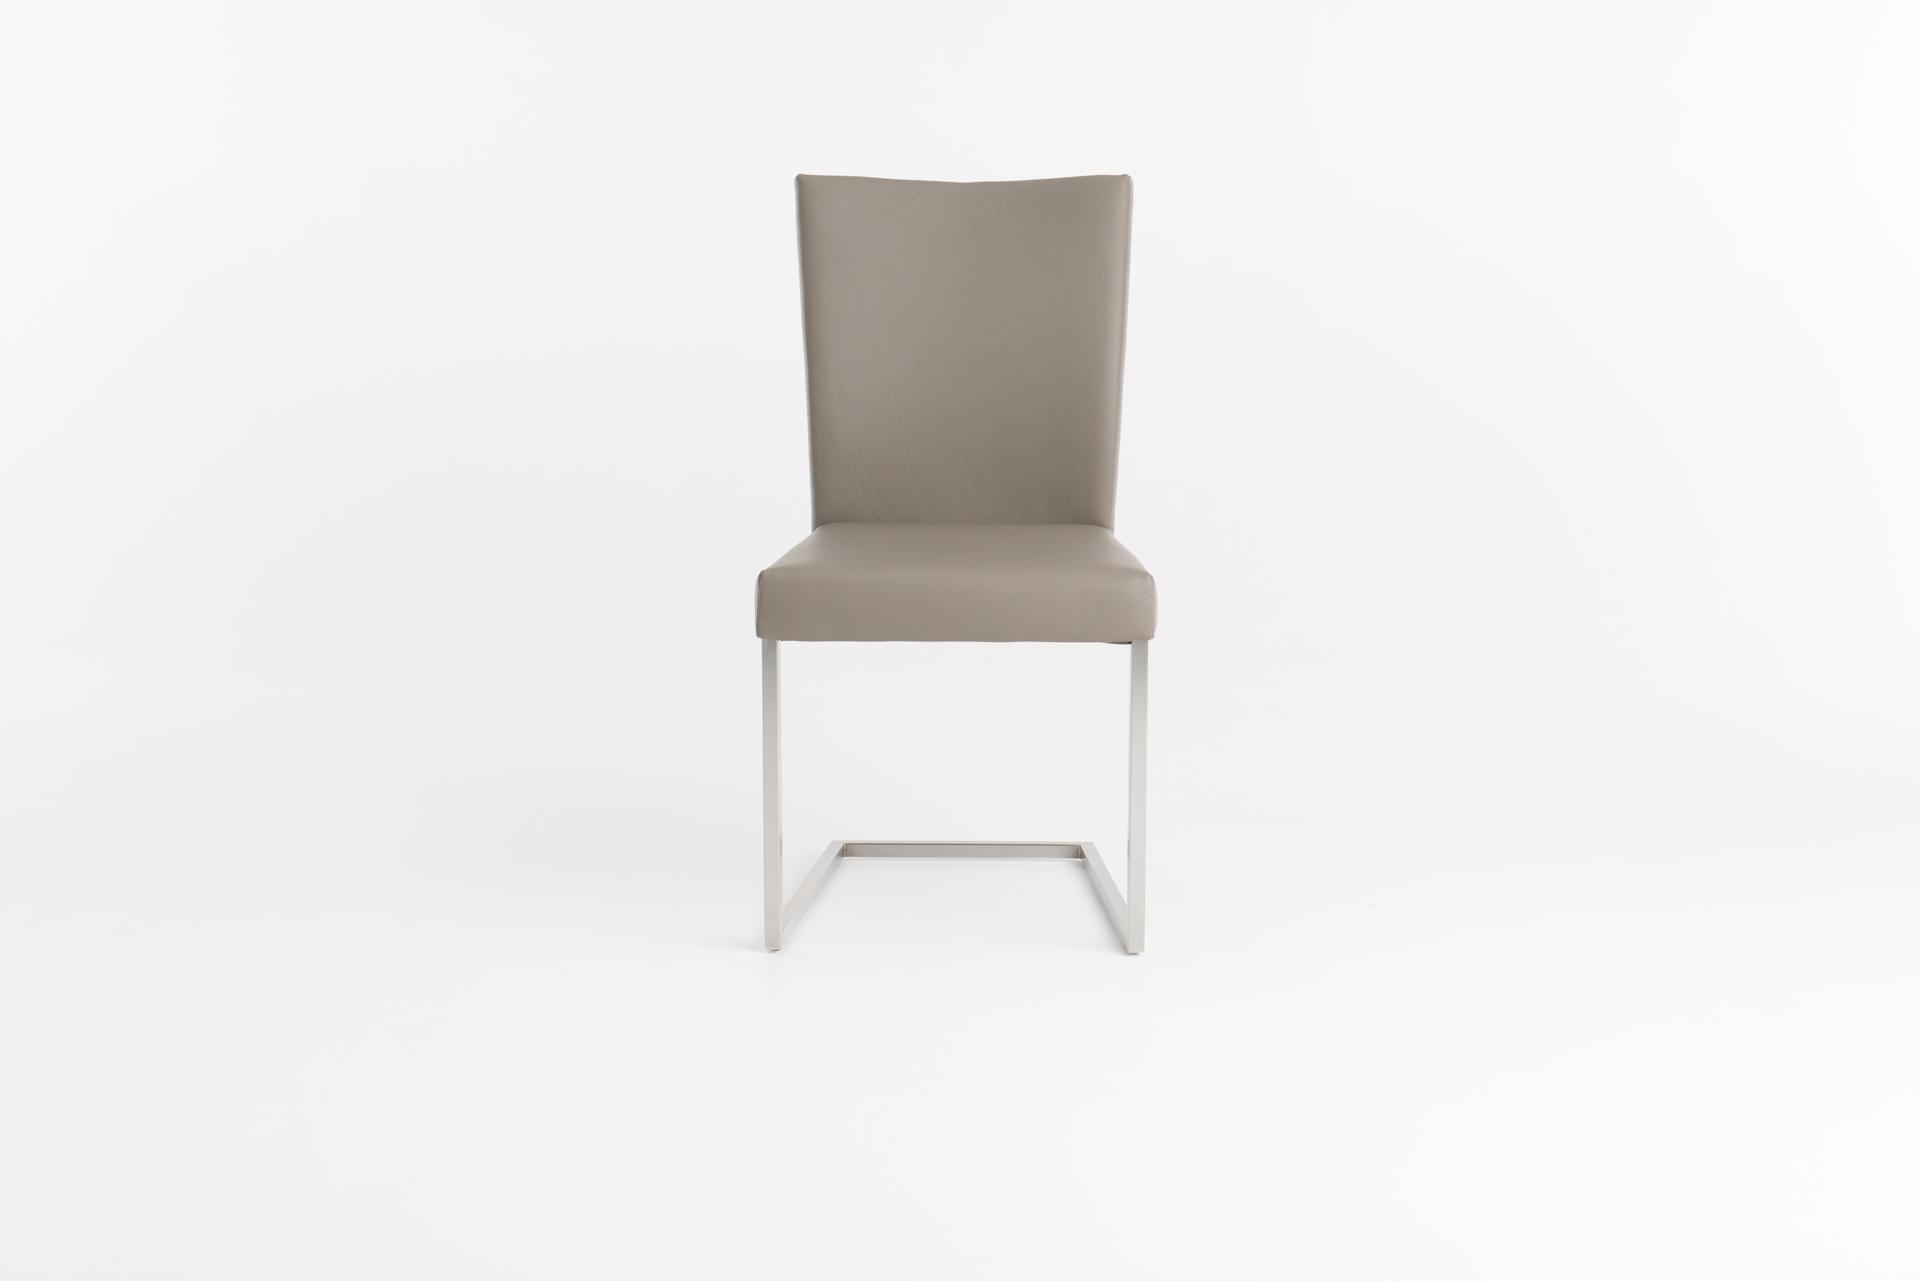 стул Misty, Bert Plantagie, фото 4